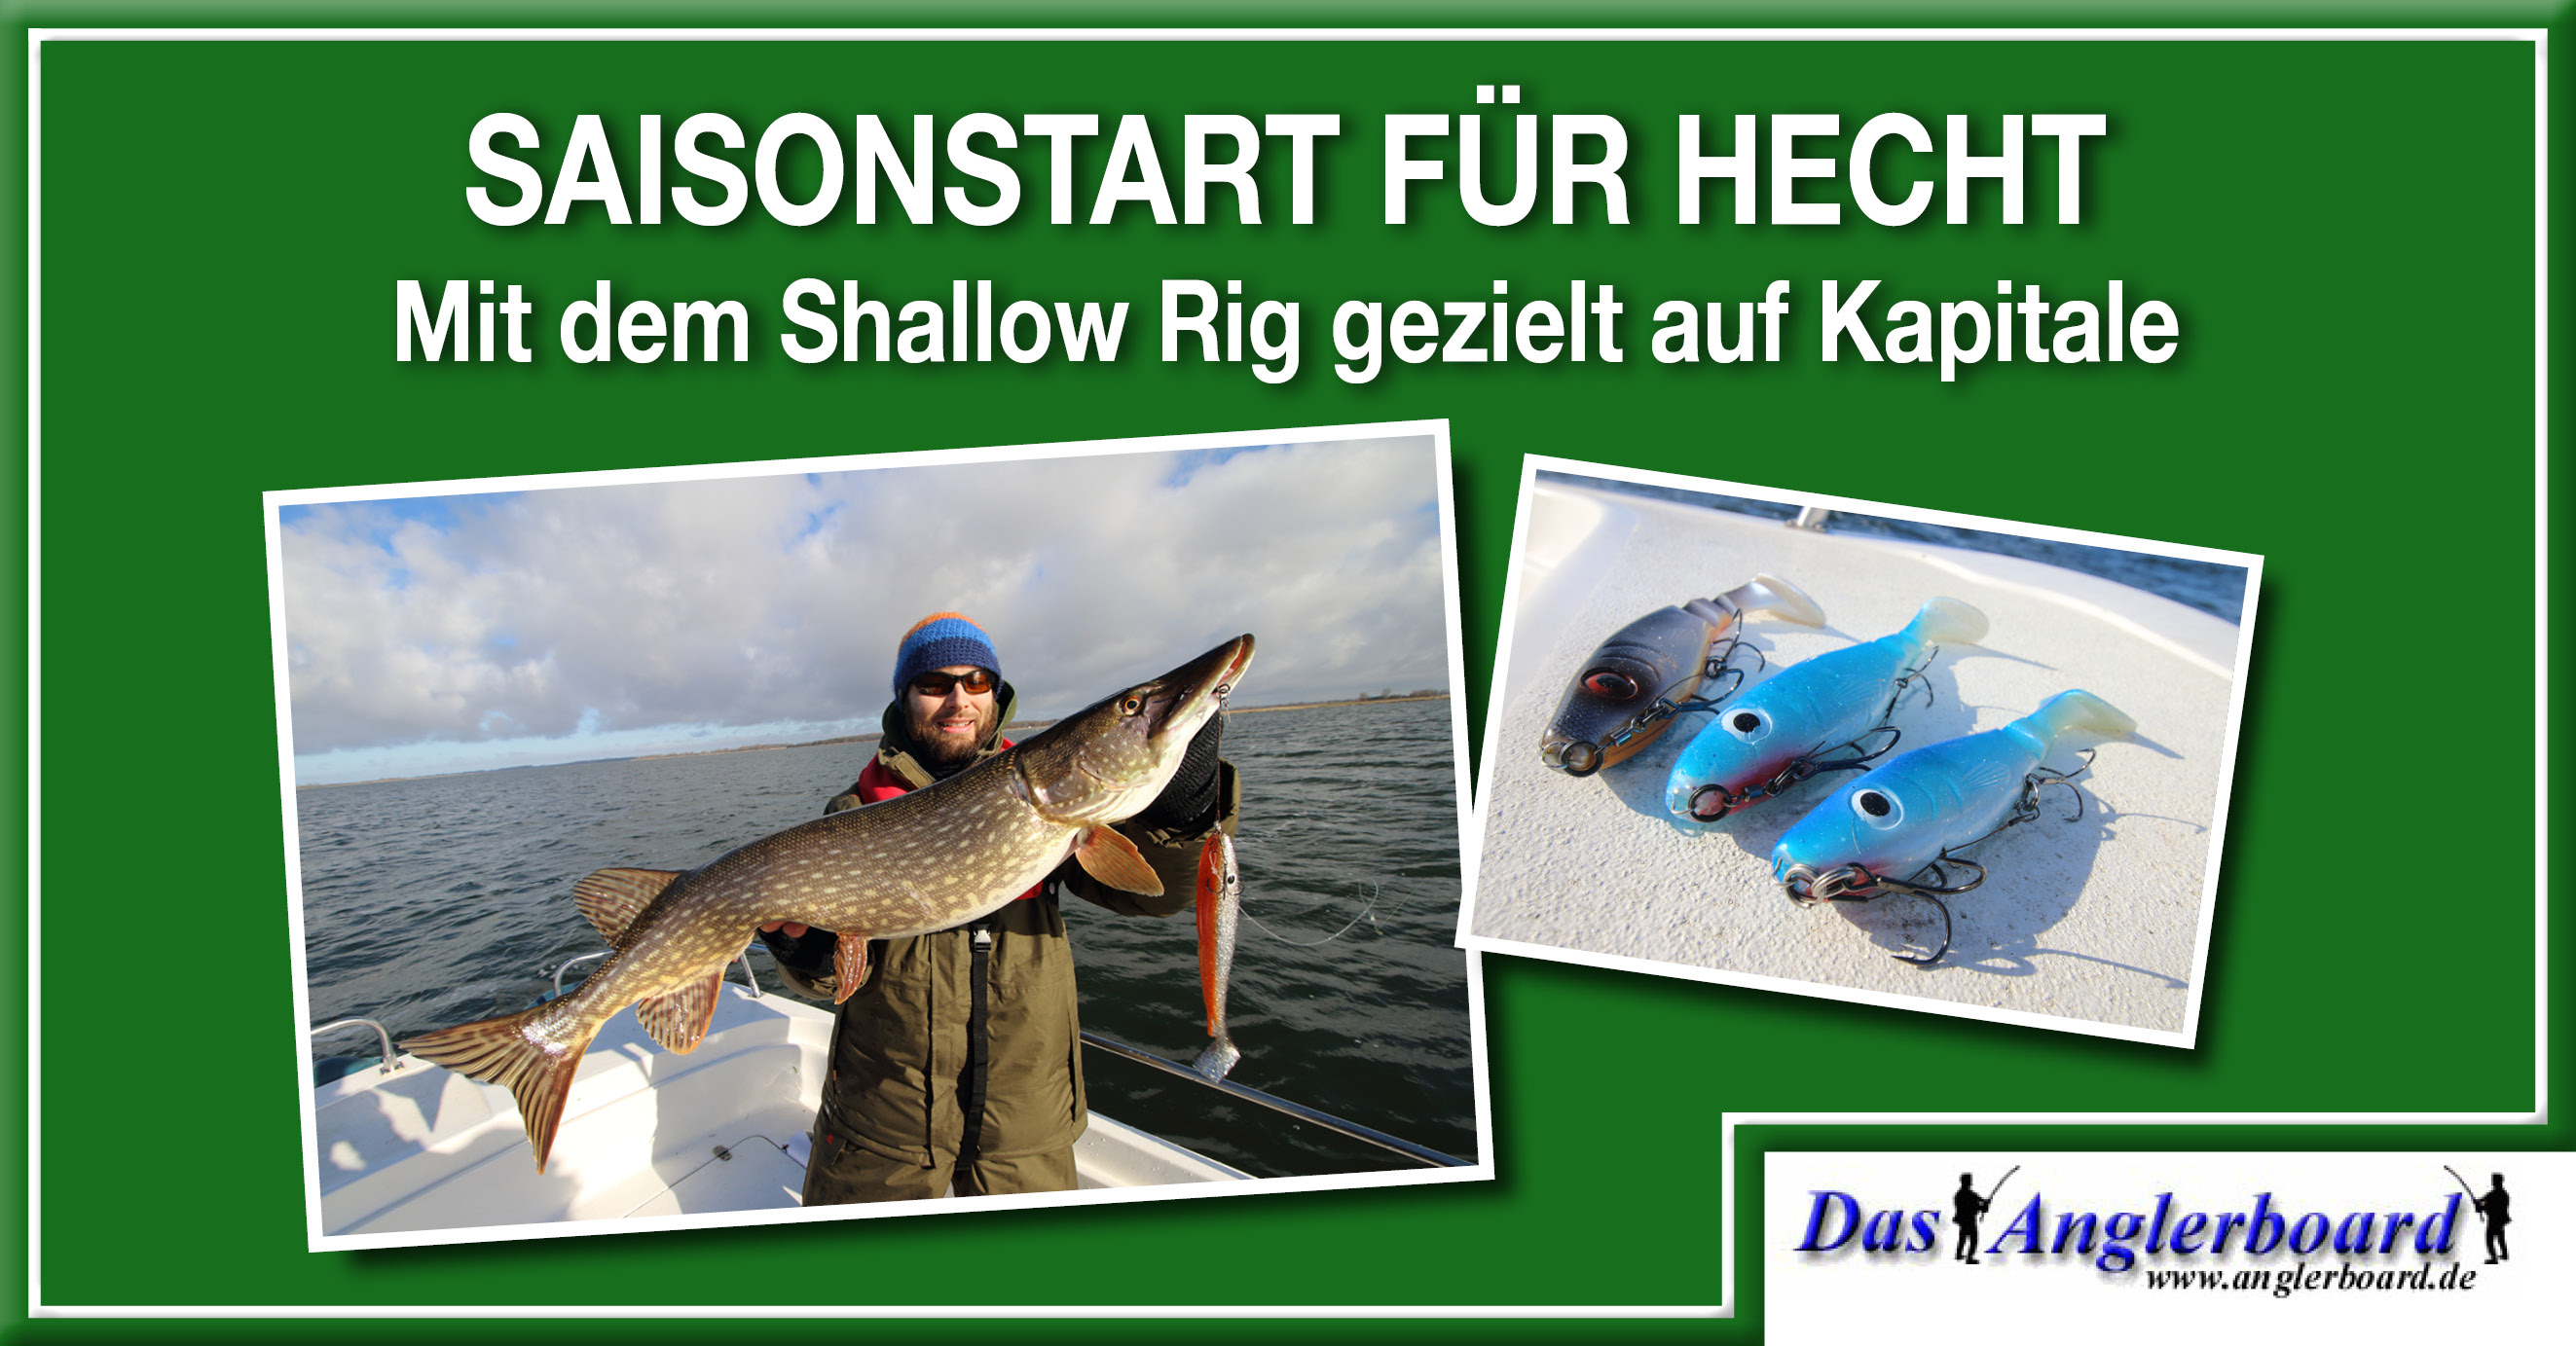 Beitragsbild-Anglerboard_635x332-SaisonstartHecht_JJ44.jpg